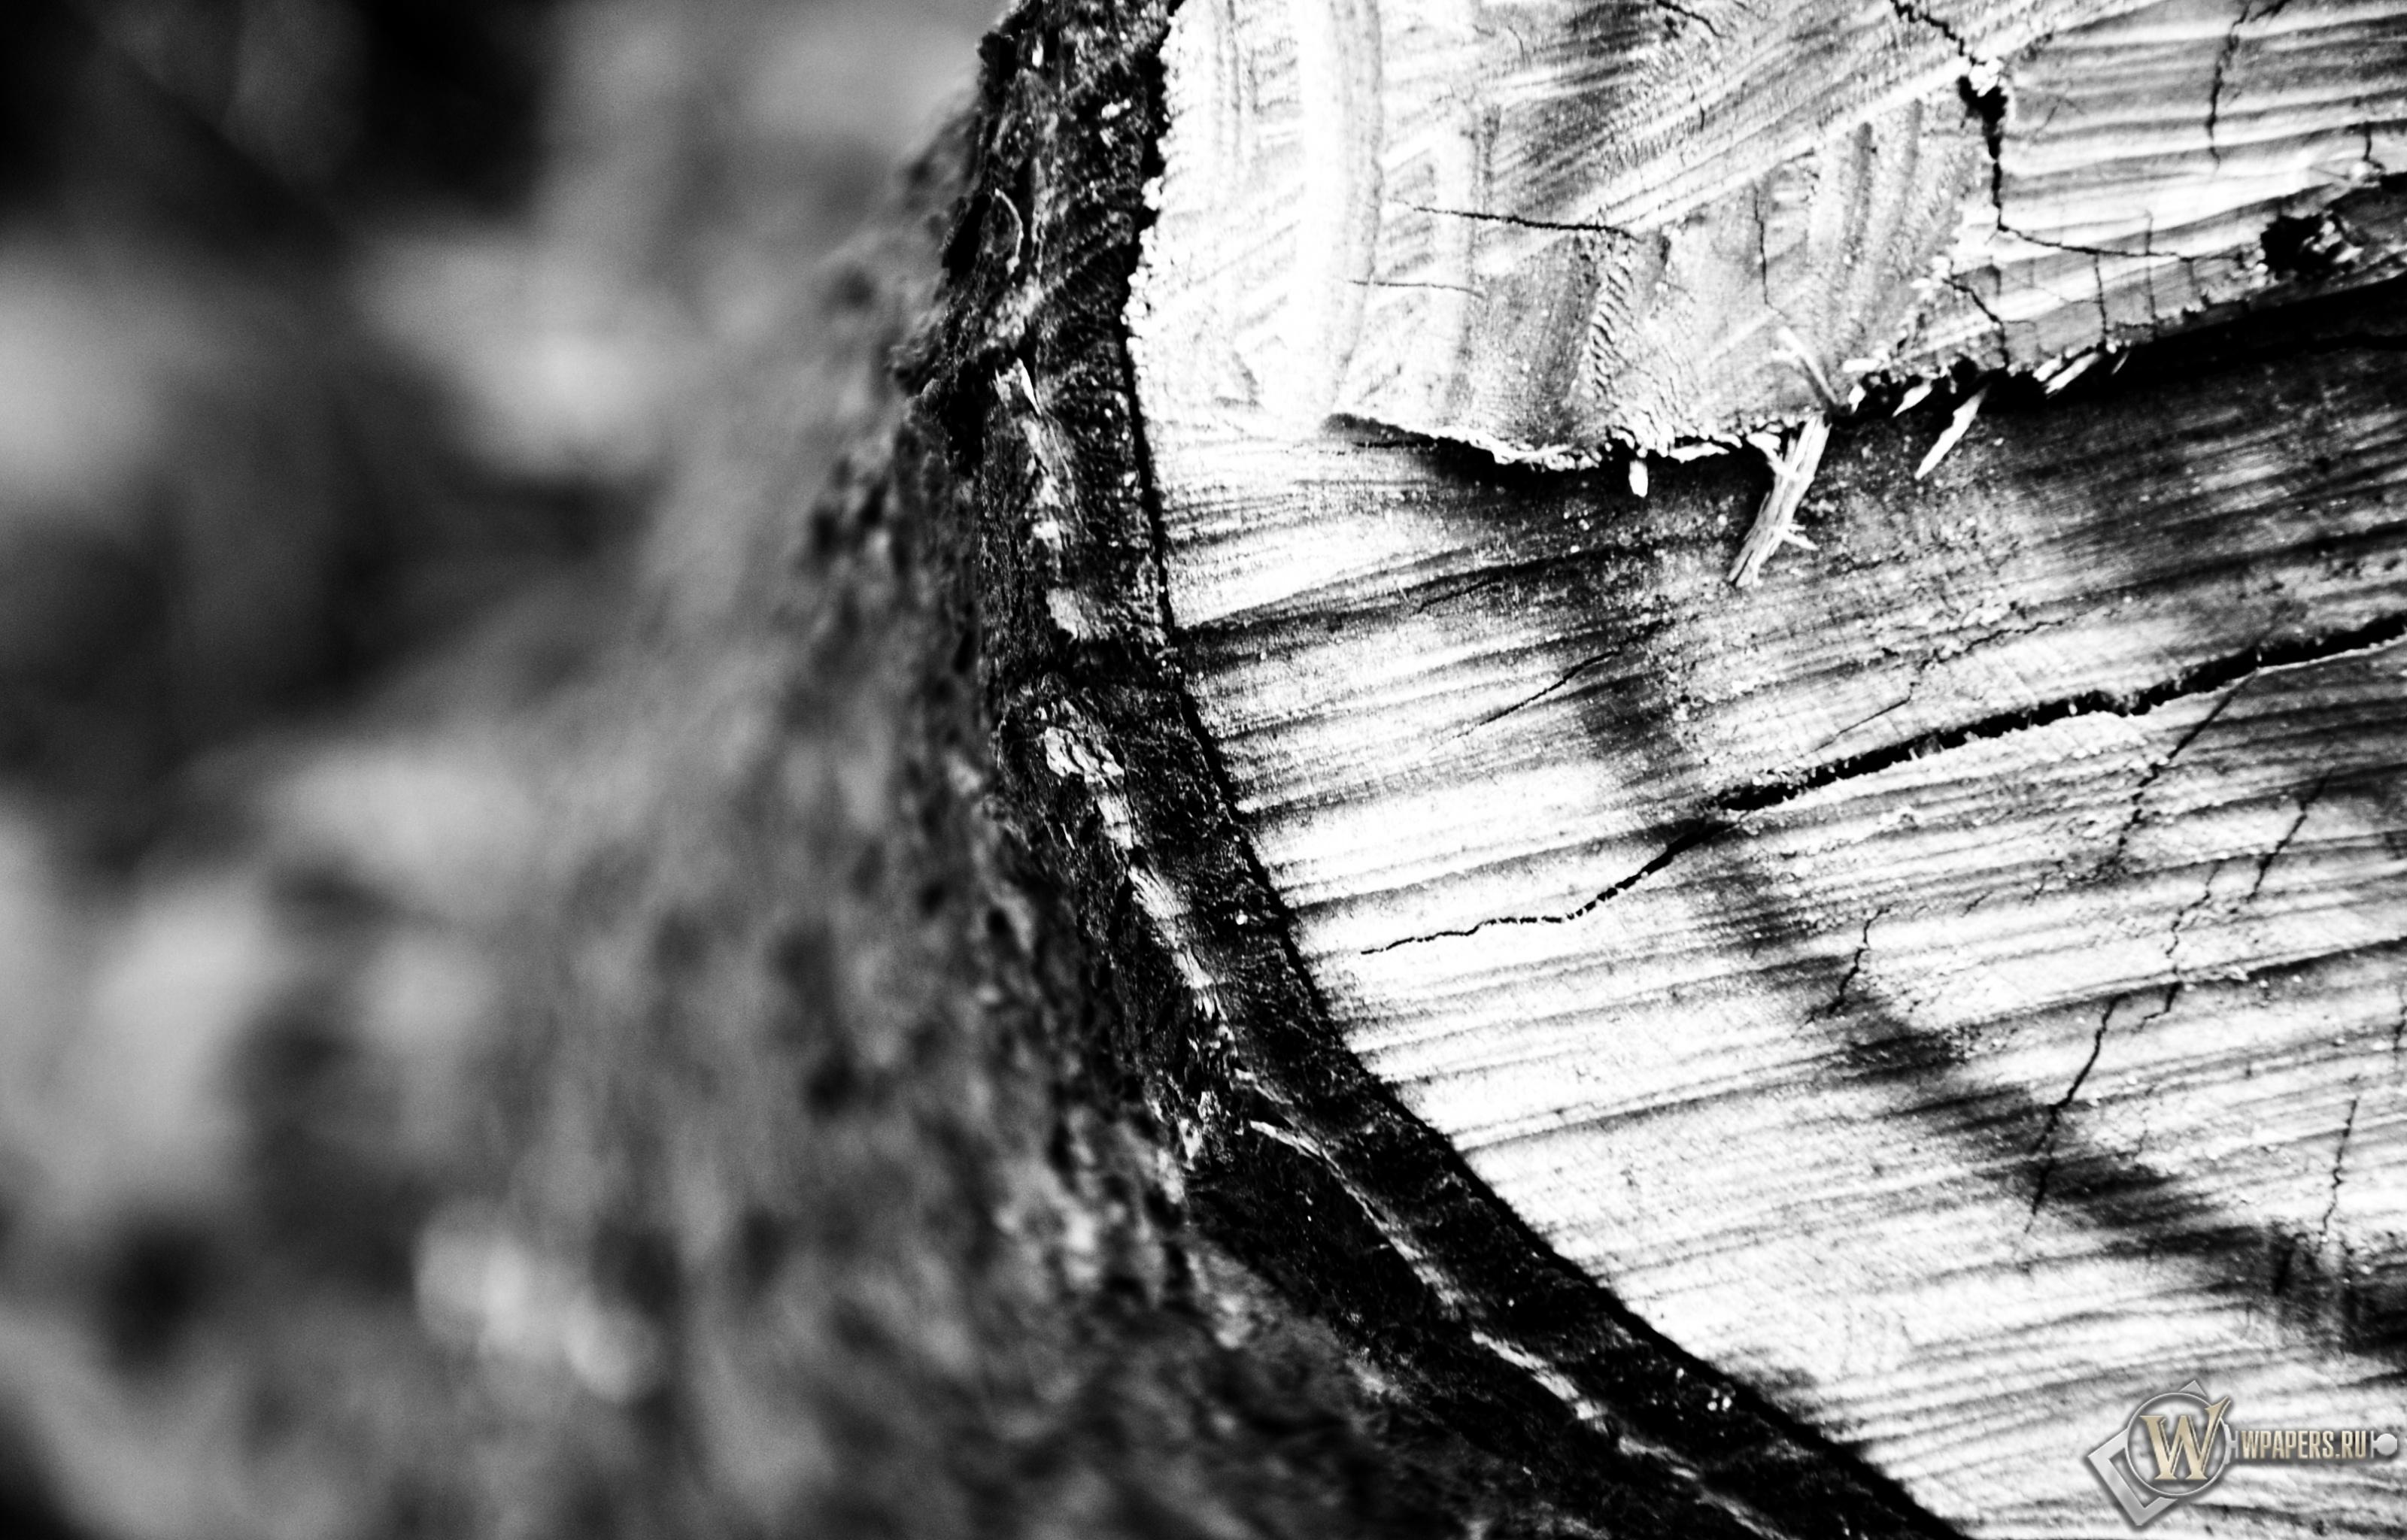 Обои разрез дерева на рабочий стол с